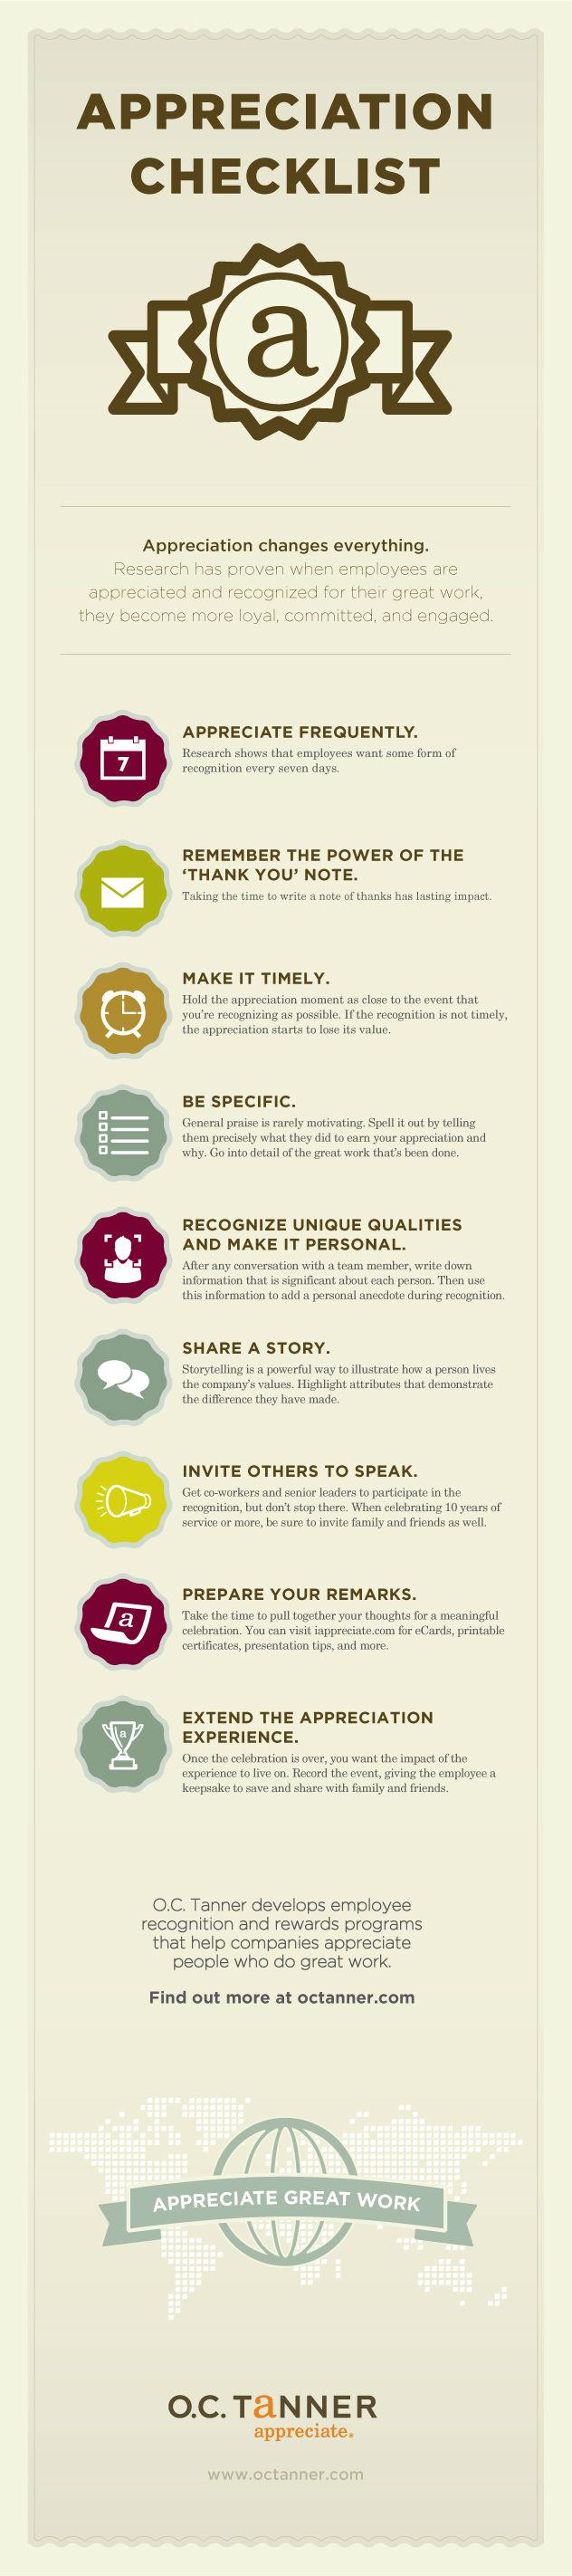 Employee Appreciation Checklist [Infographic]